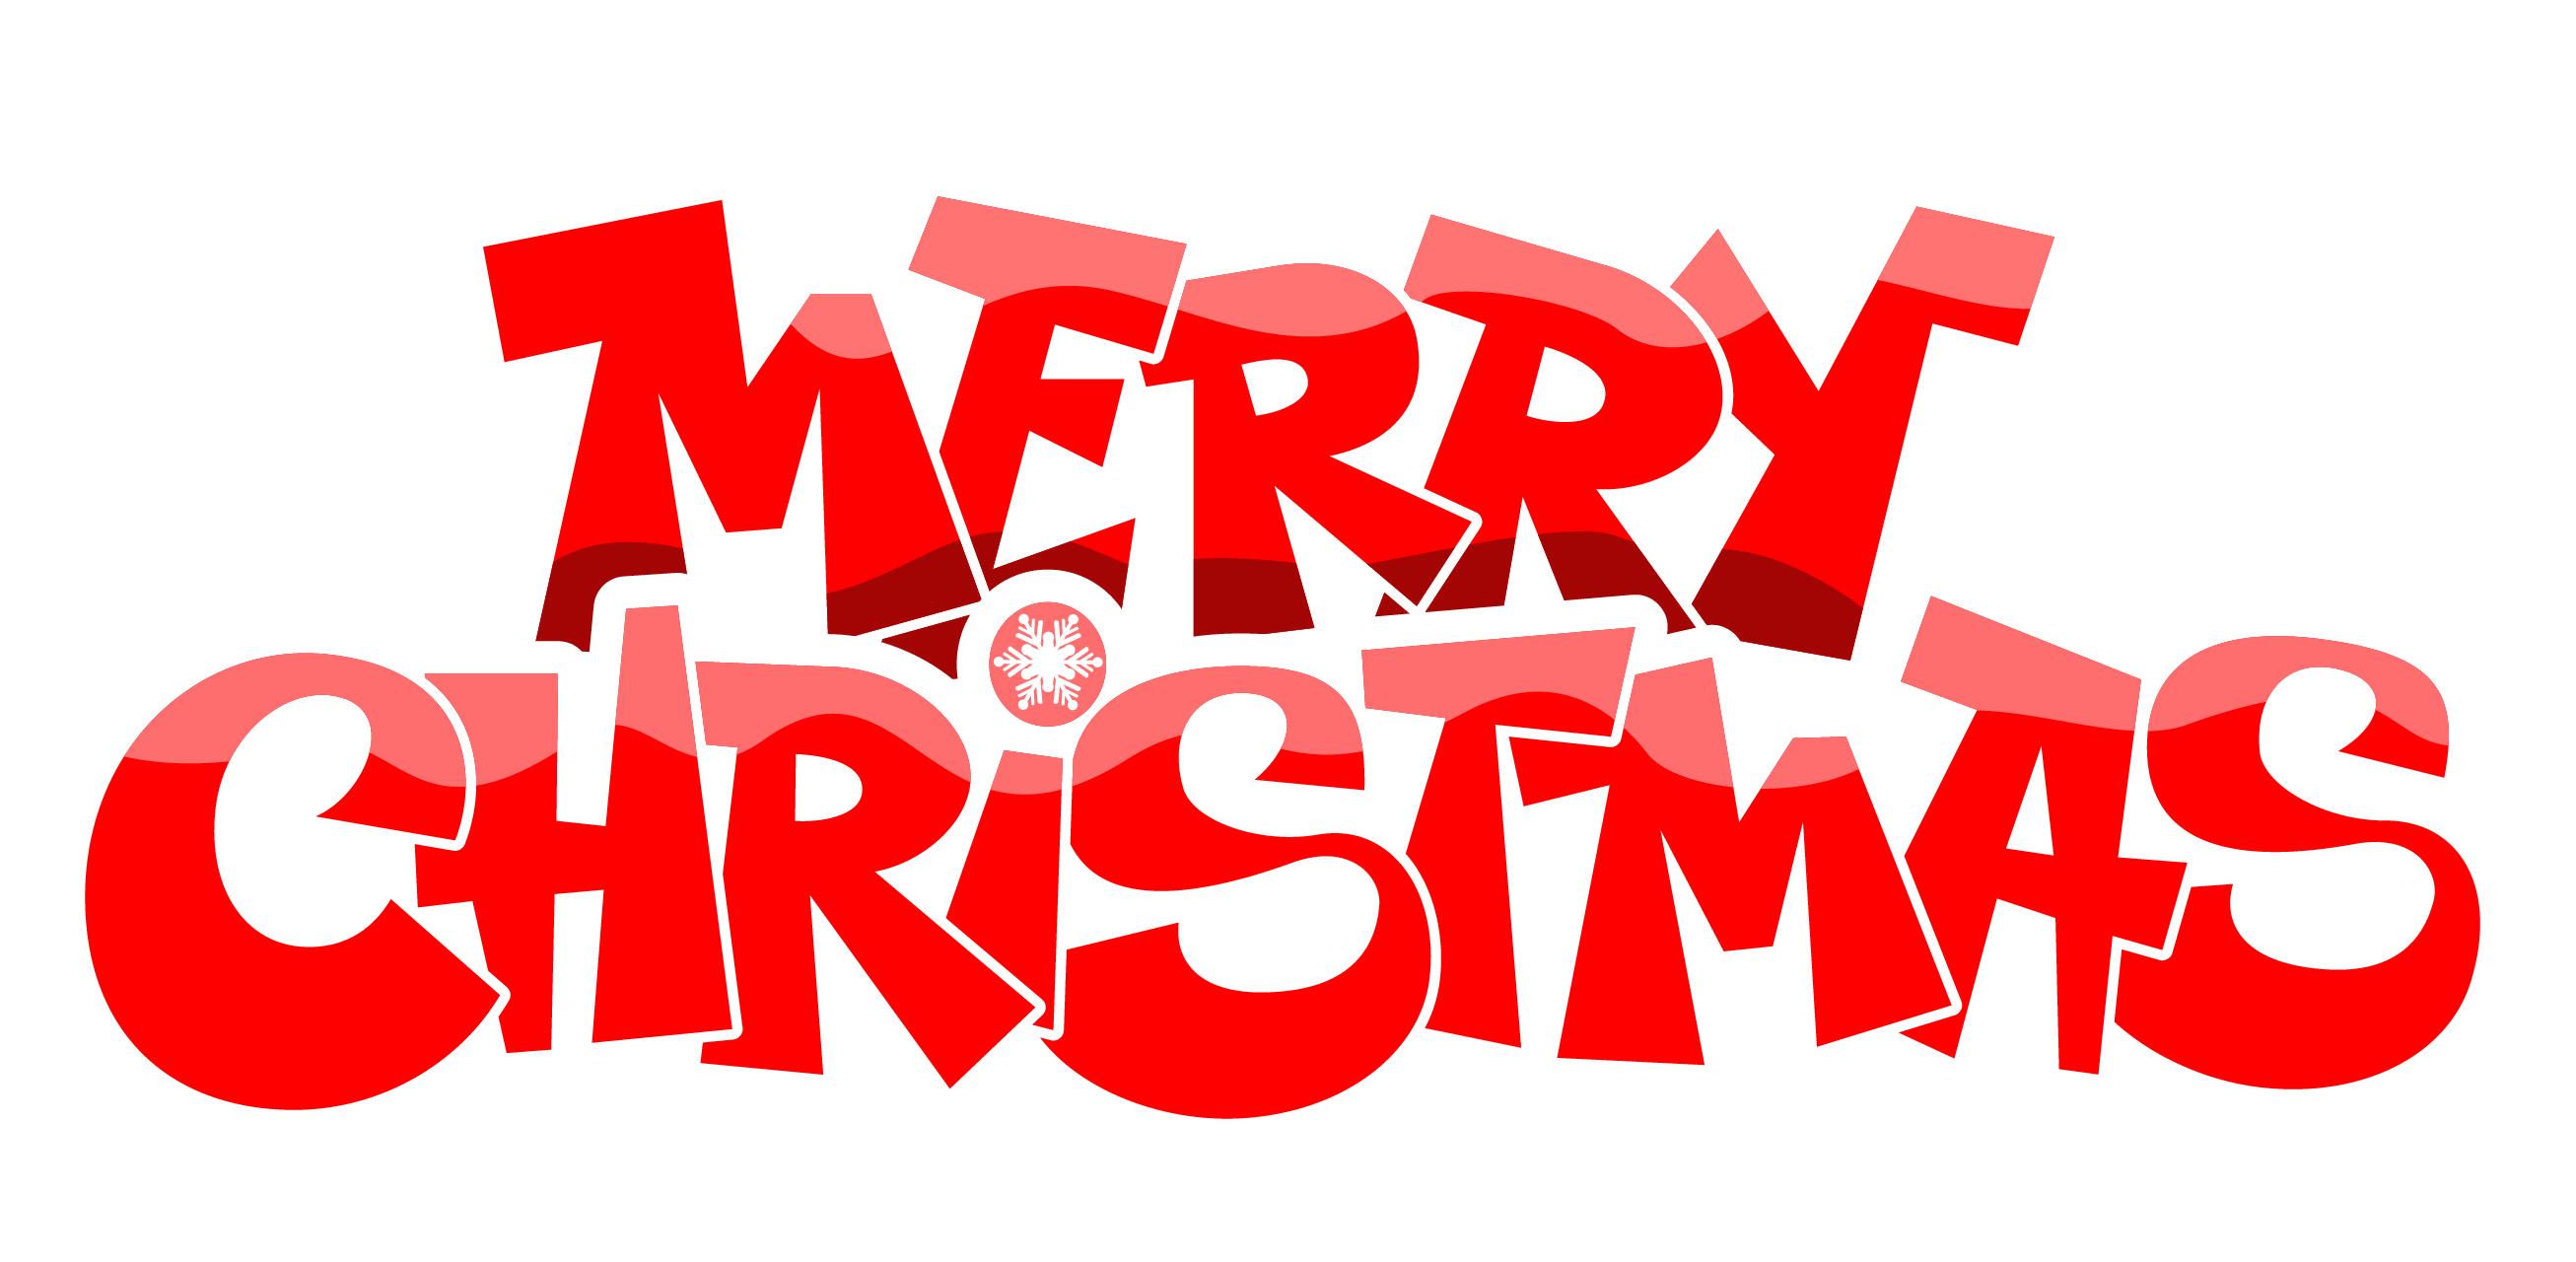 Merry Christmas Logo Christmas Photo 40884966 Fanpop Christmas Text Christmas Greetings Quotes Merry Christmas Minions